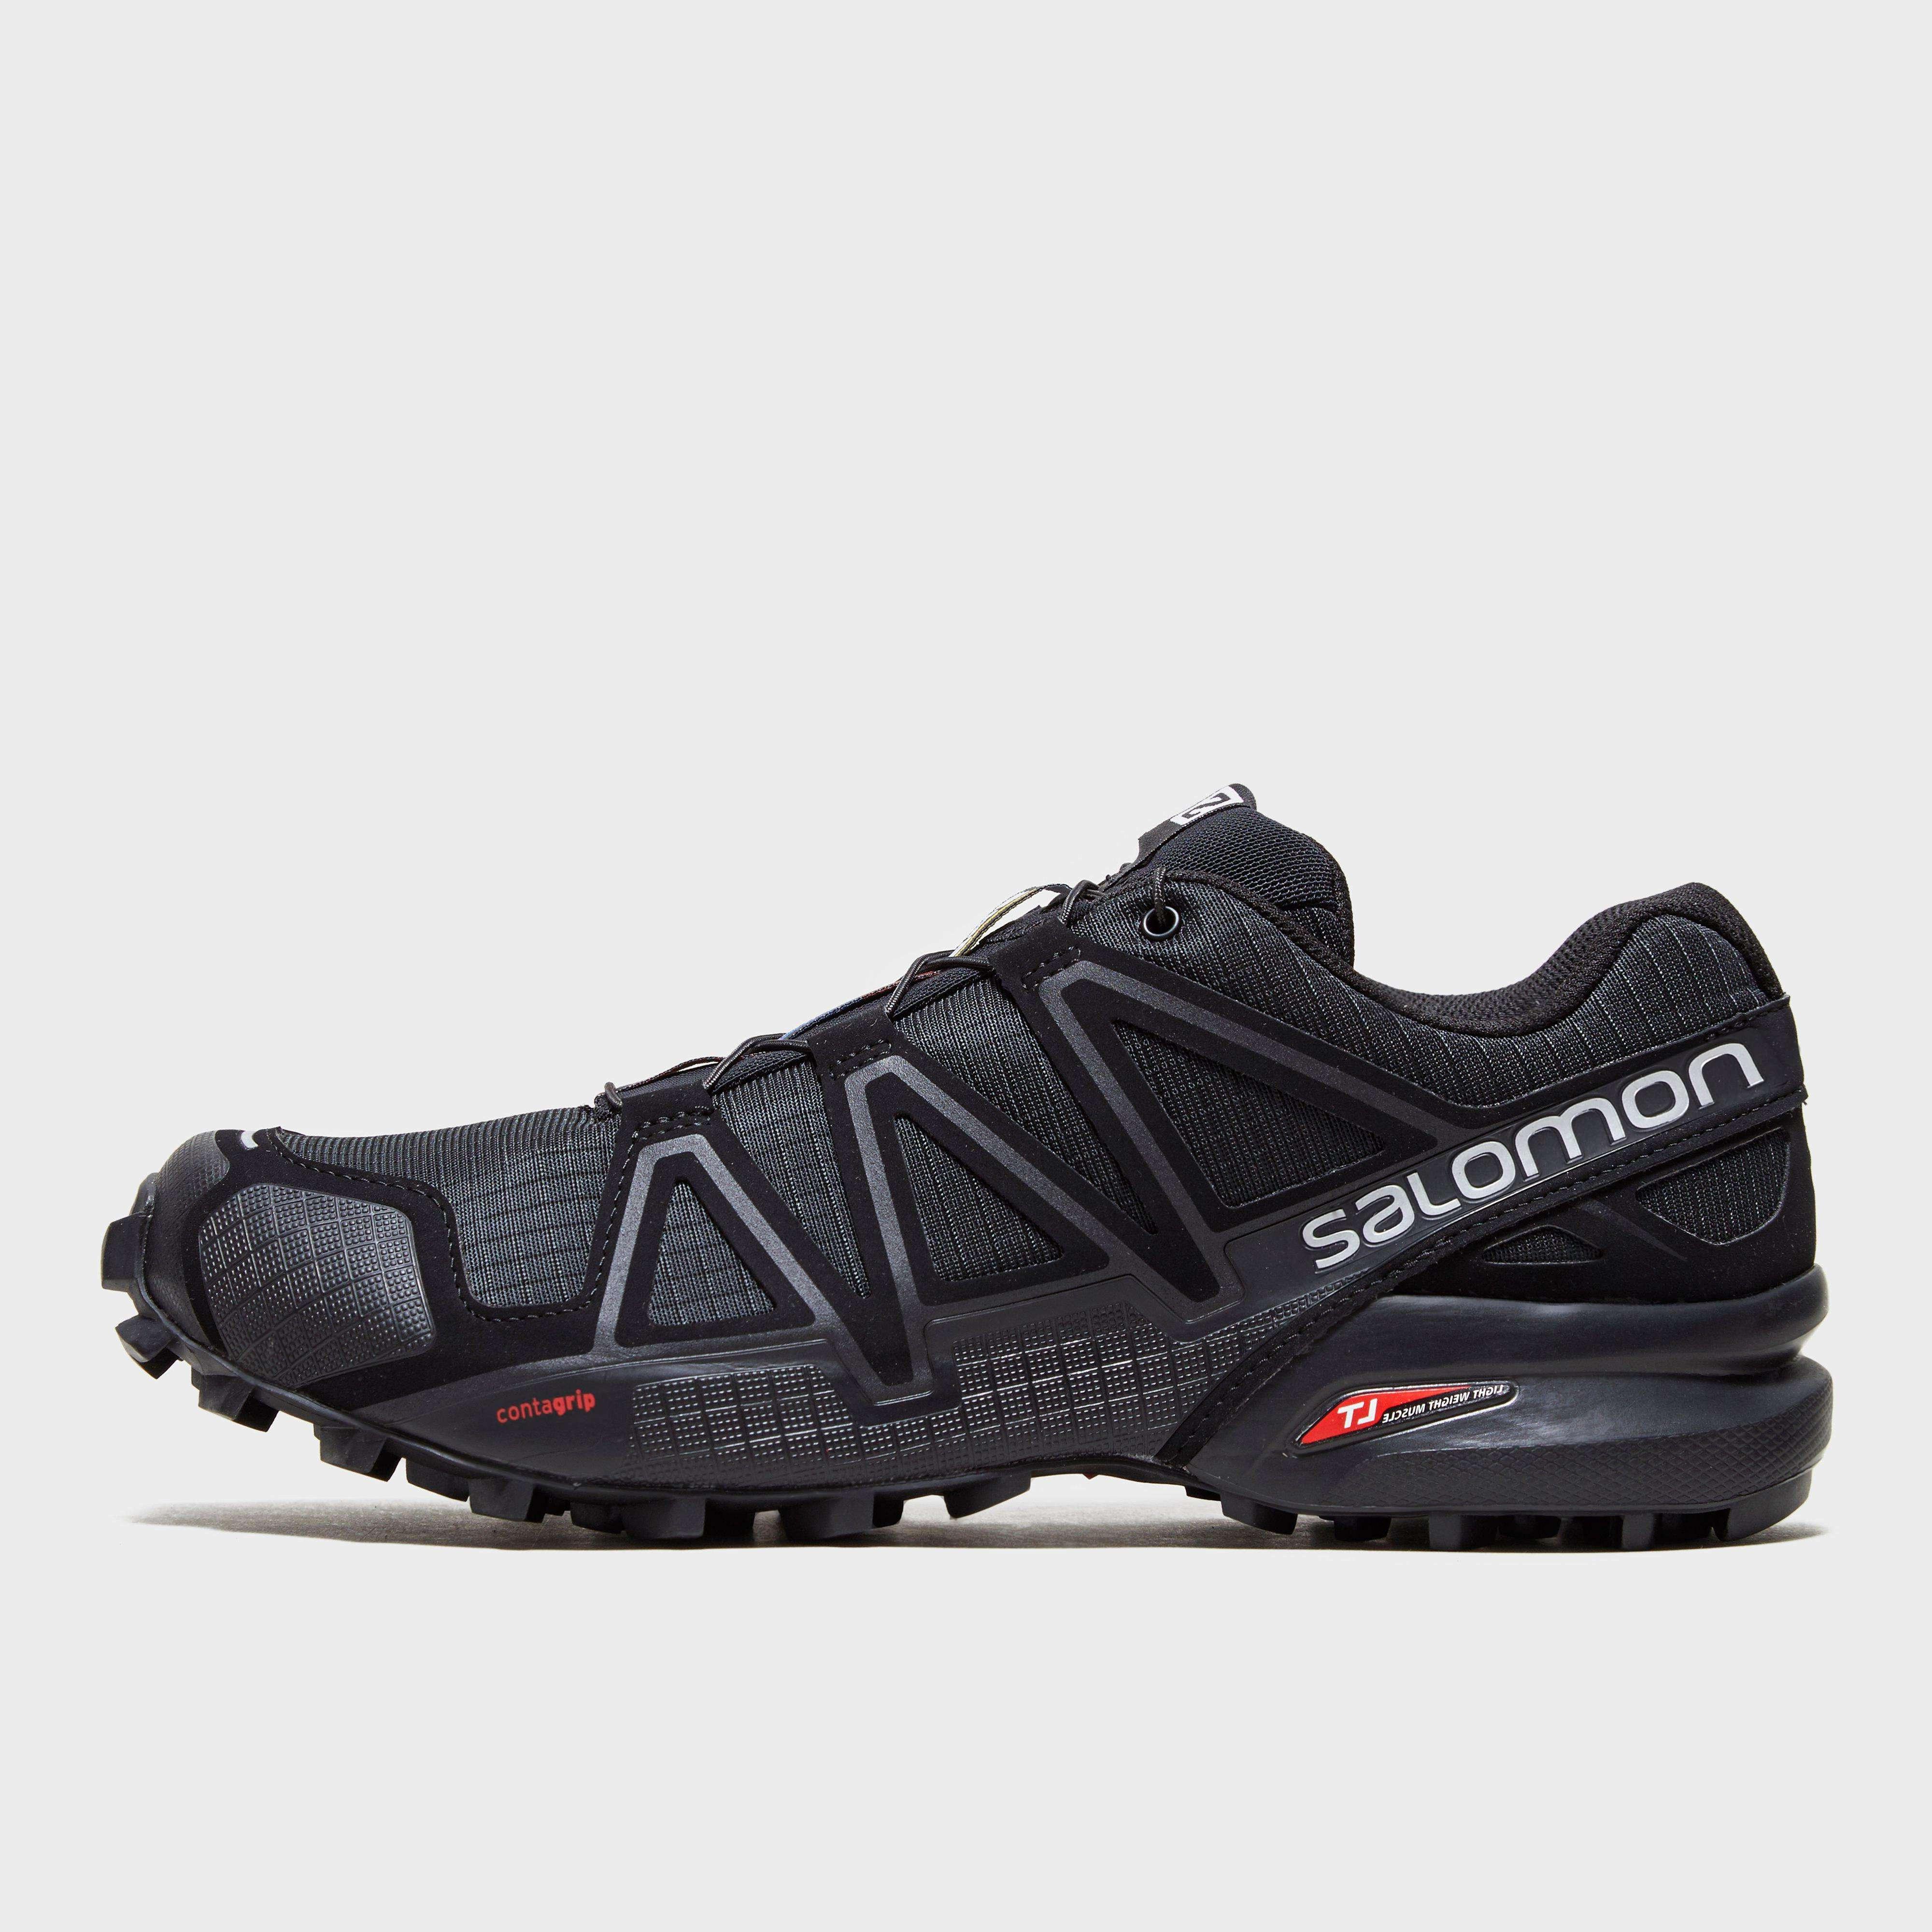 SALOMON Men's Speedcross 4 Trail Running Shoes